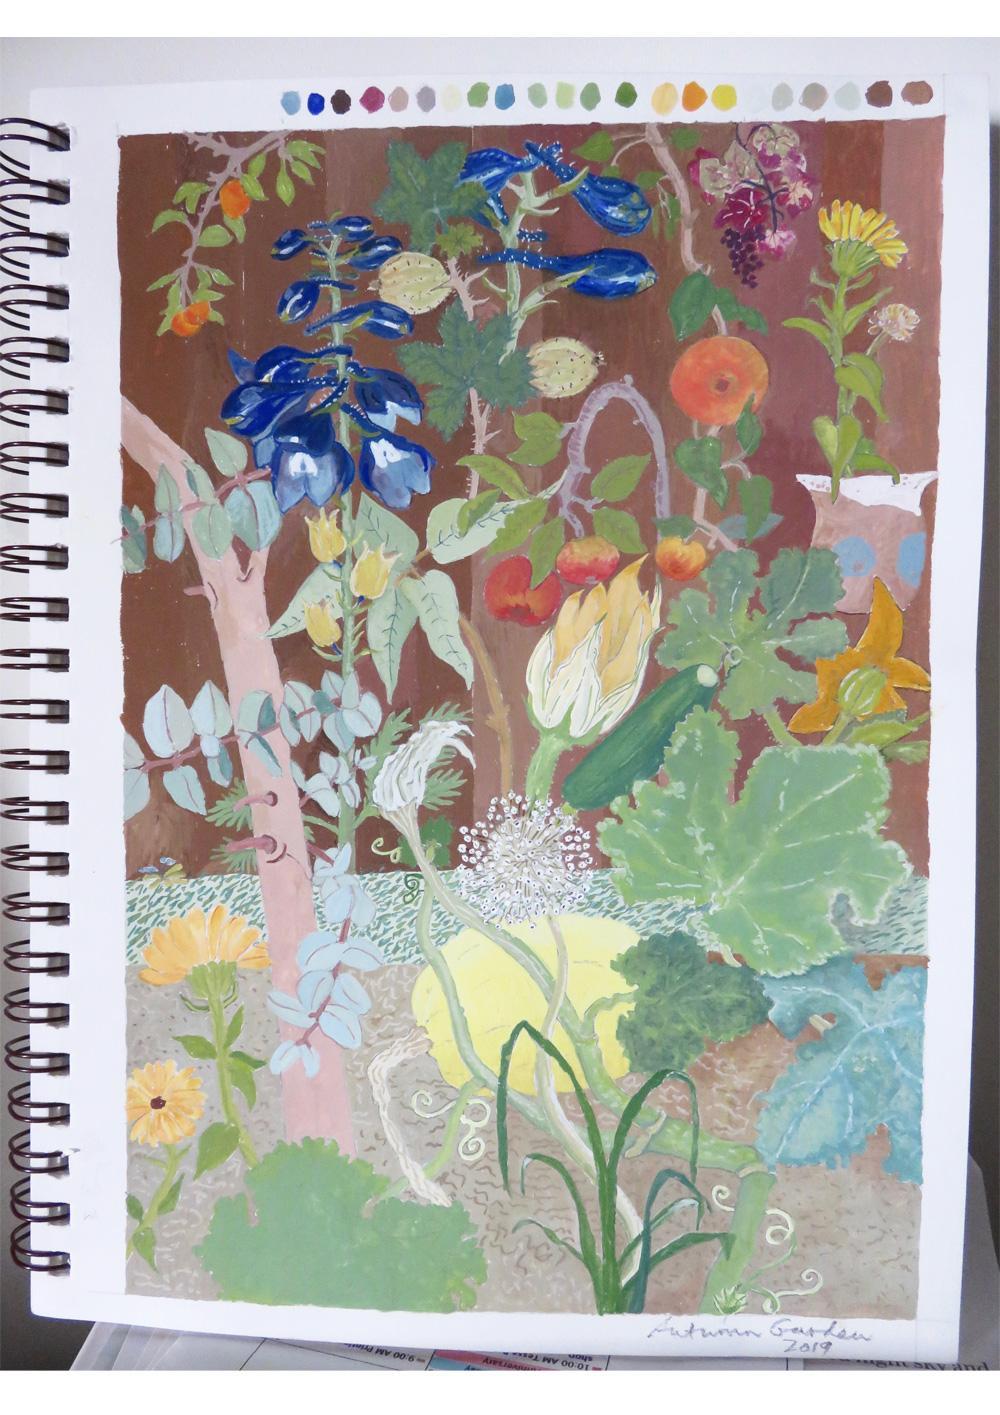 Autumn Garden 2019 - image 2 - student project